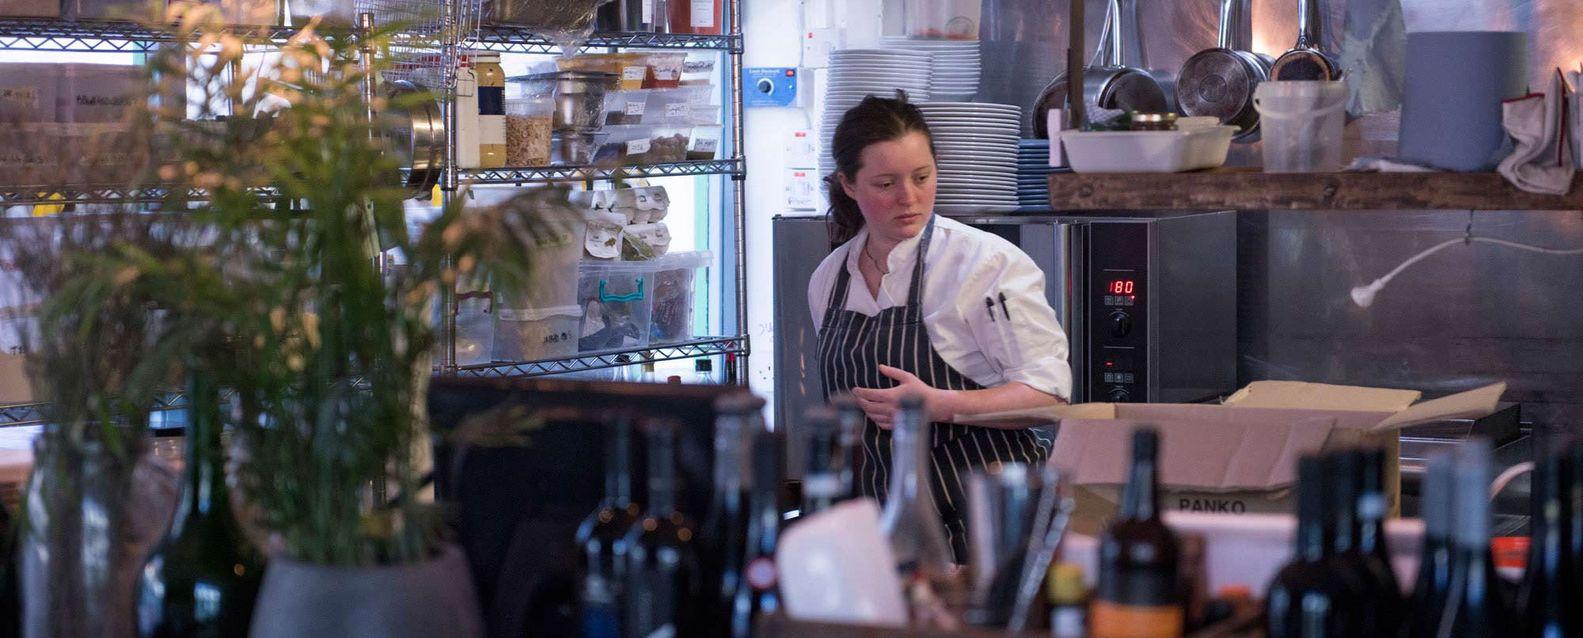 Female chef in the kitchen